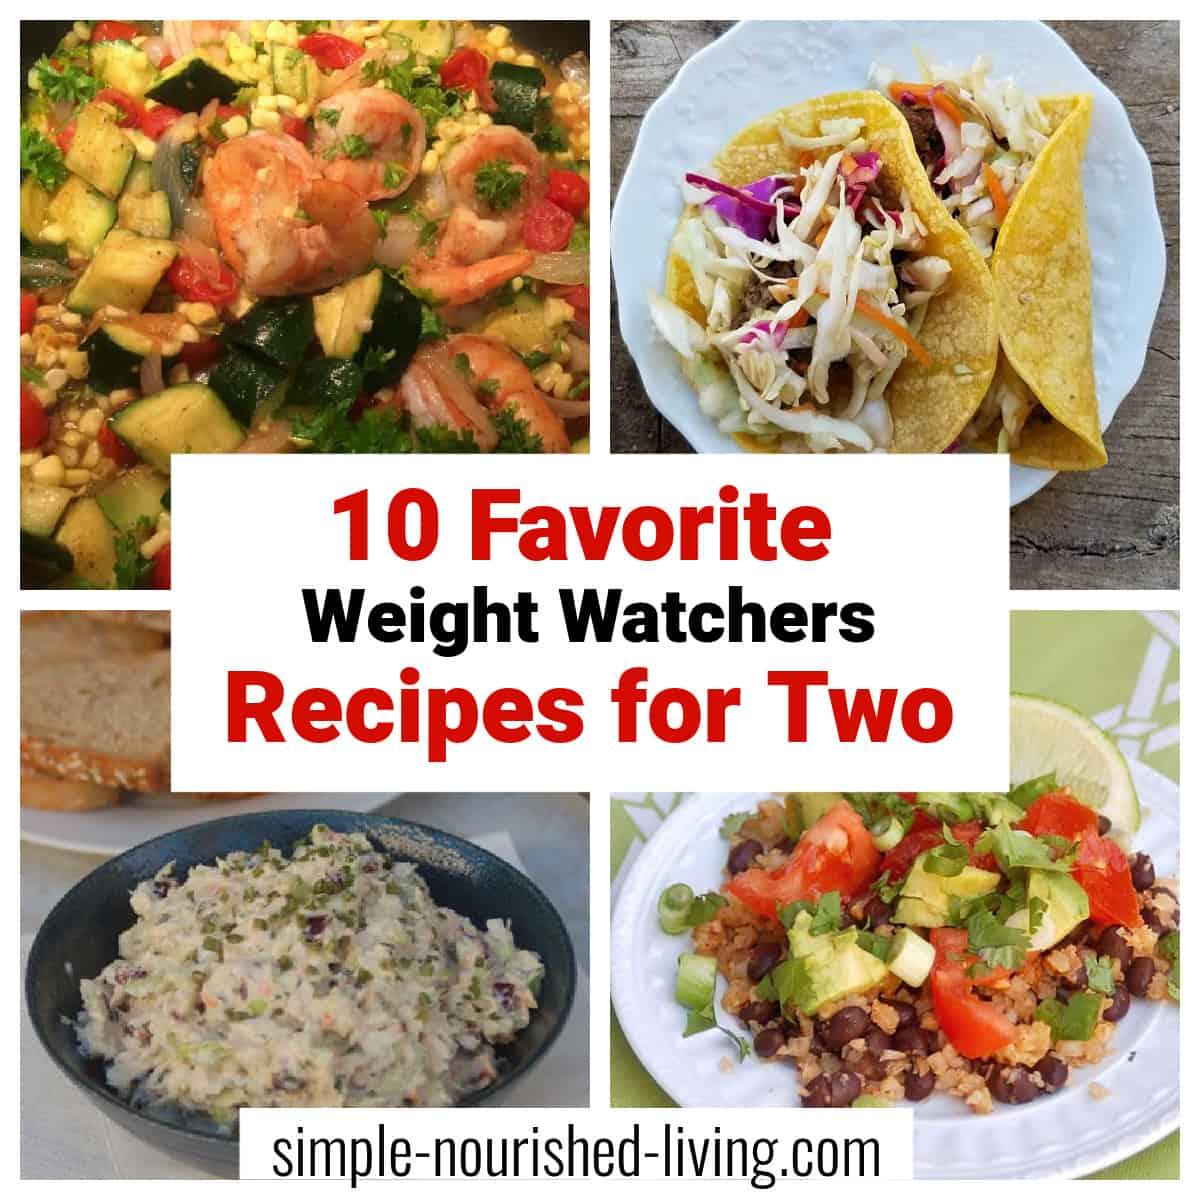 Collage with shrimp stir fry, cauliflower rice and beans, Asian pork tacos and crunchy tuna salad.